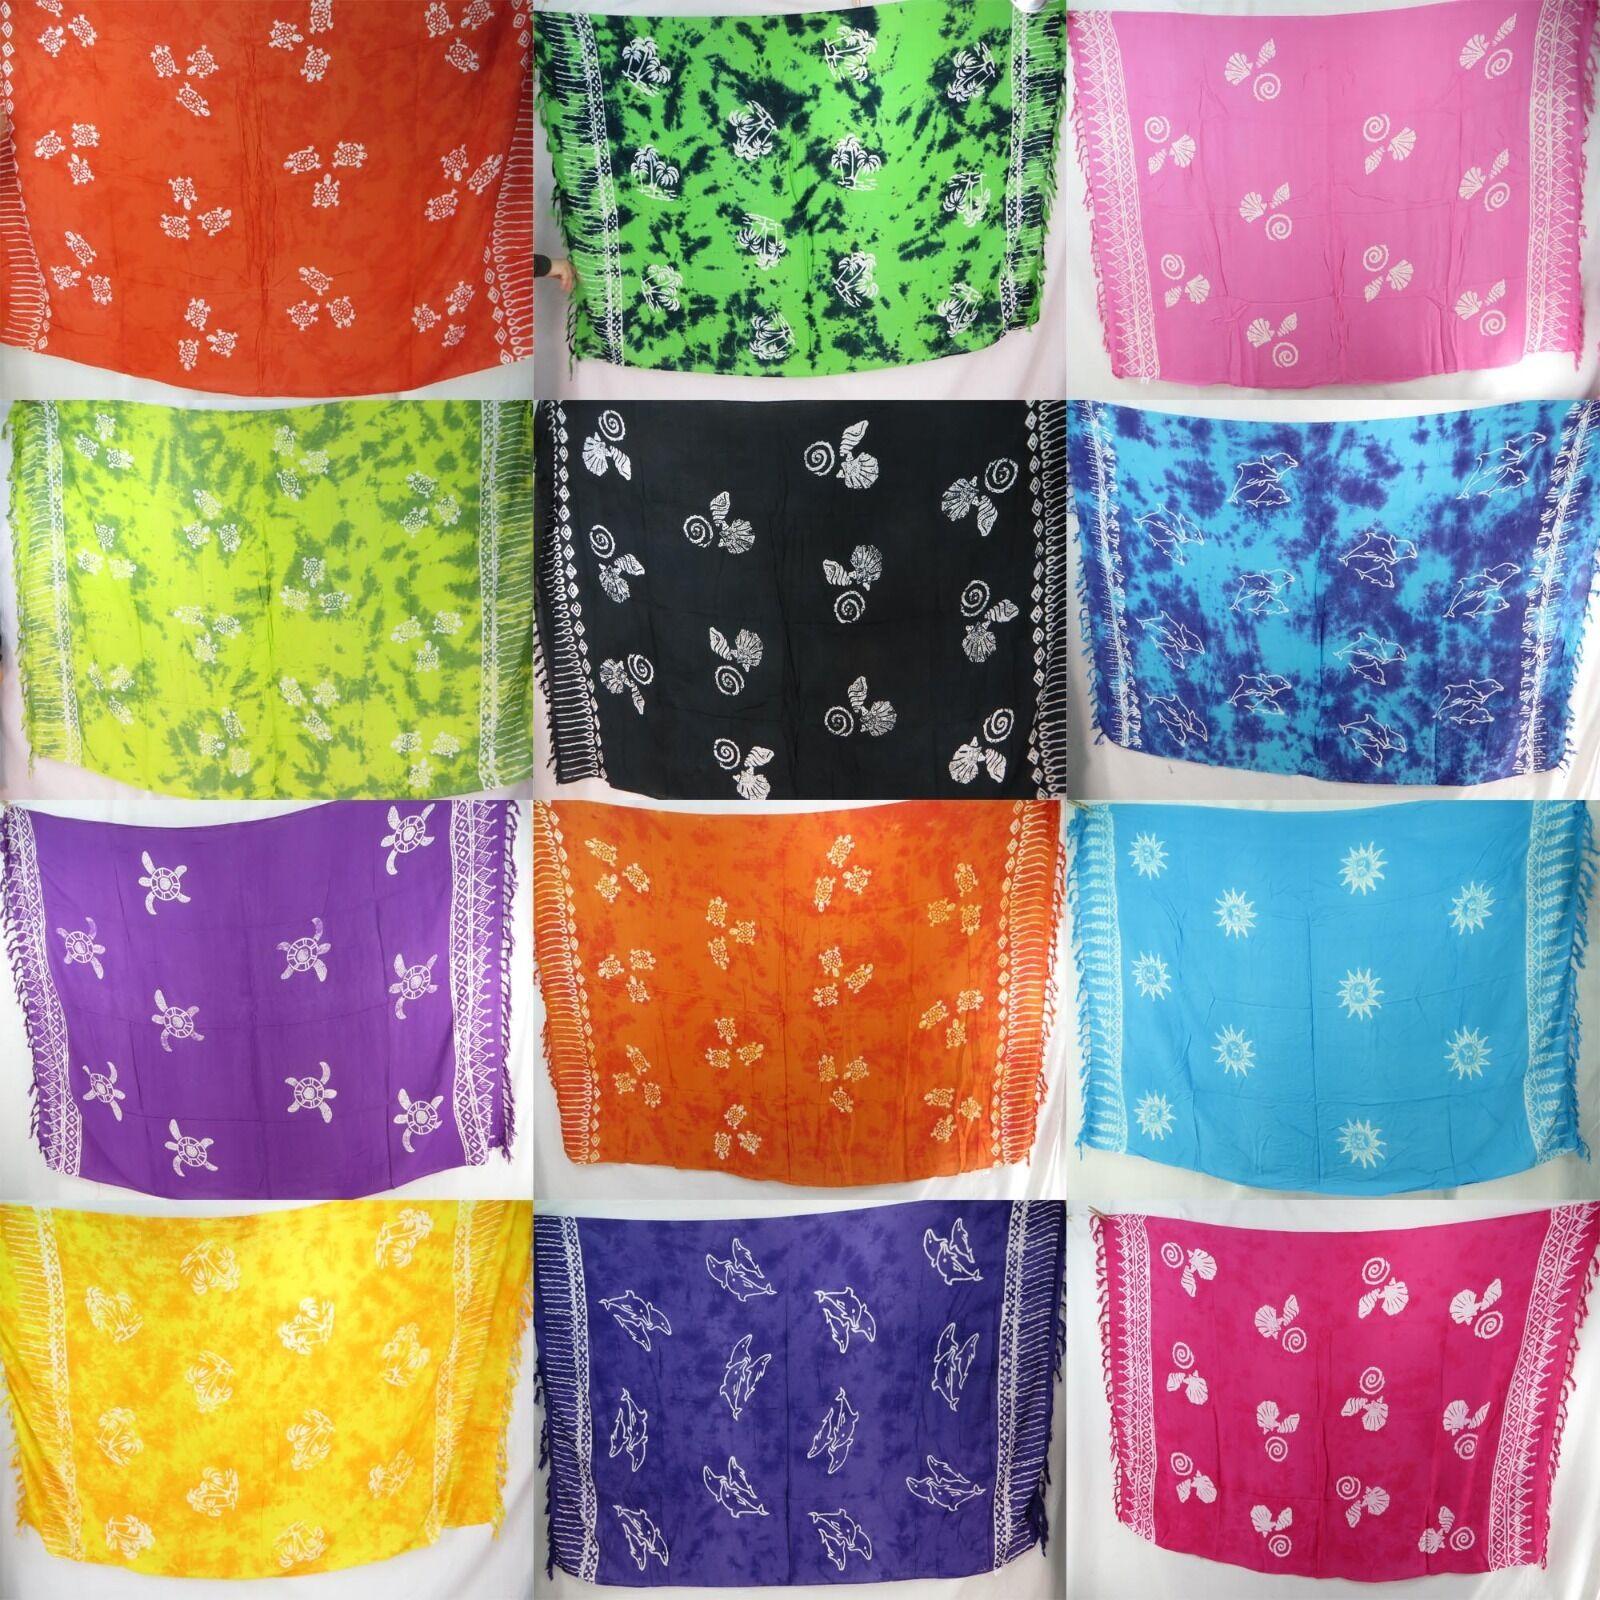 5pcs Bali Rayon Sarong Bulk Wholesale Hippie Clothing Par...